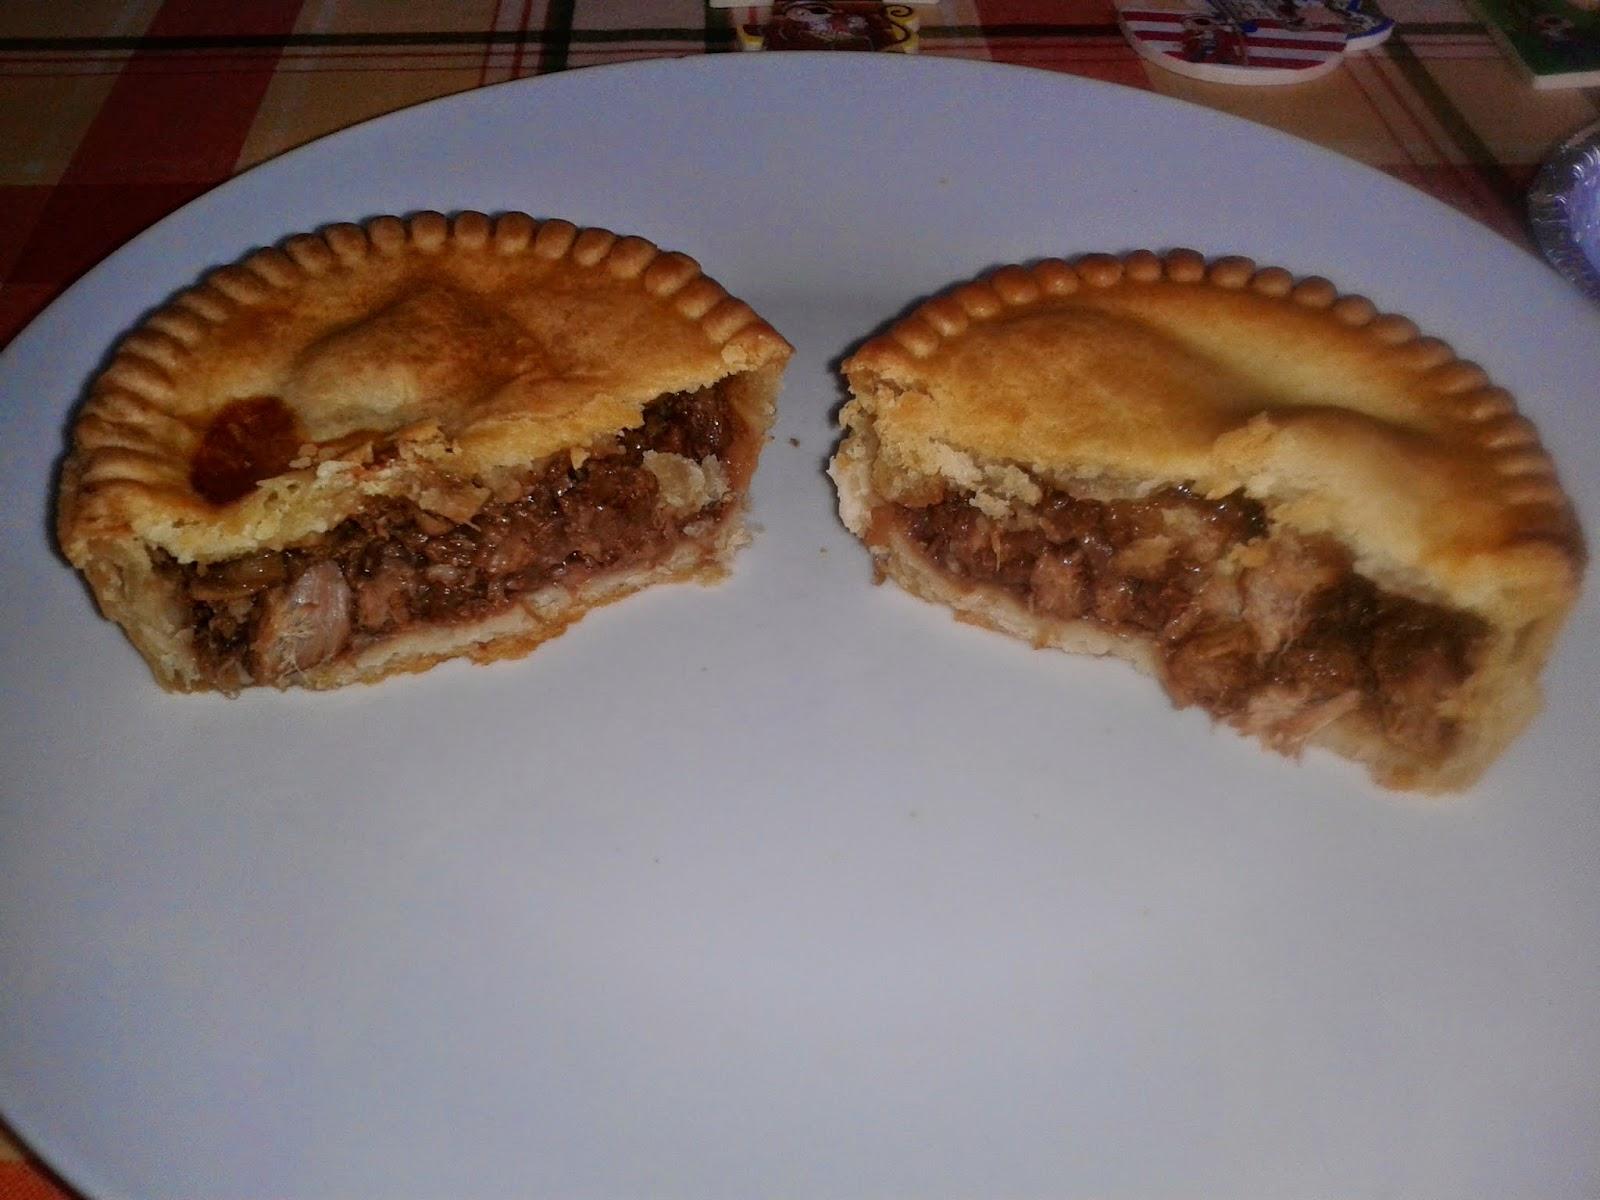 Pocklington's Steak Pie - Microwaved Edition